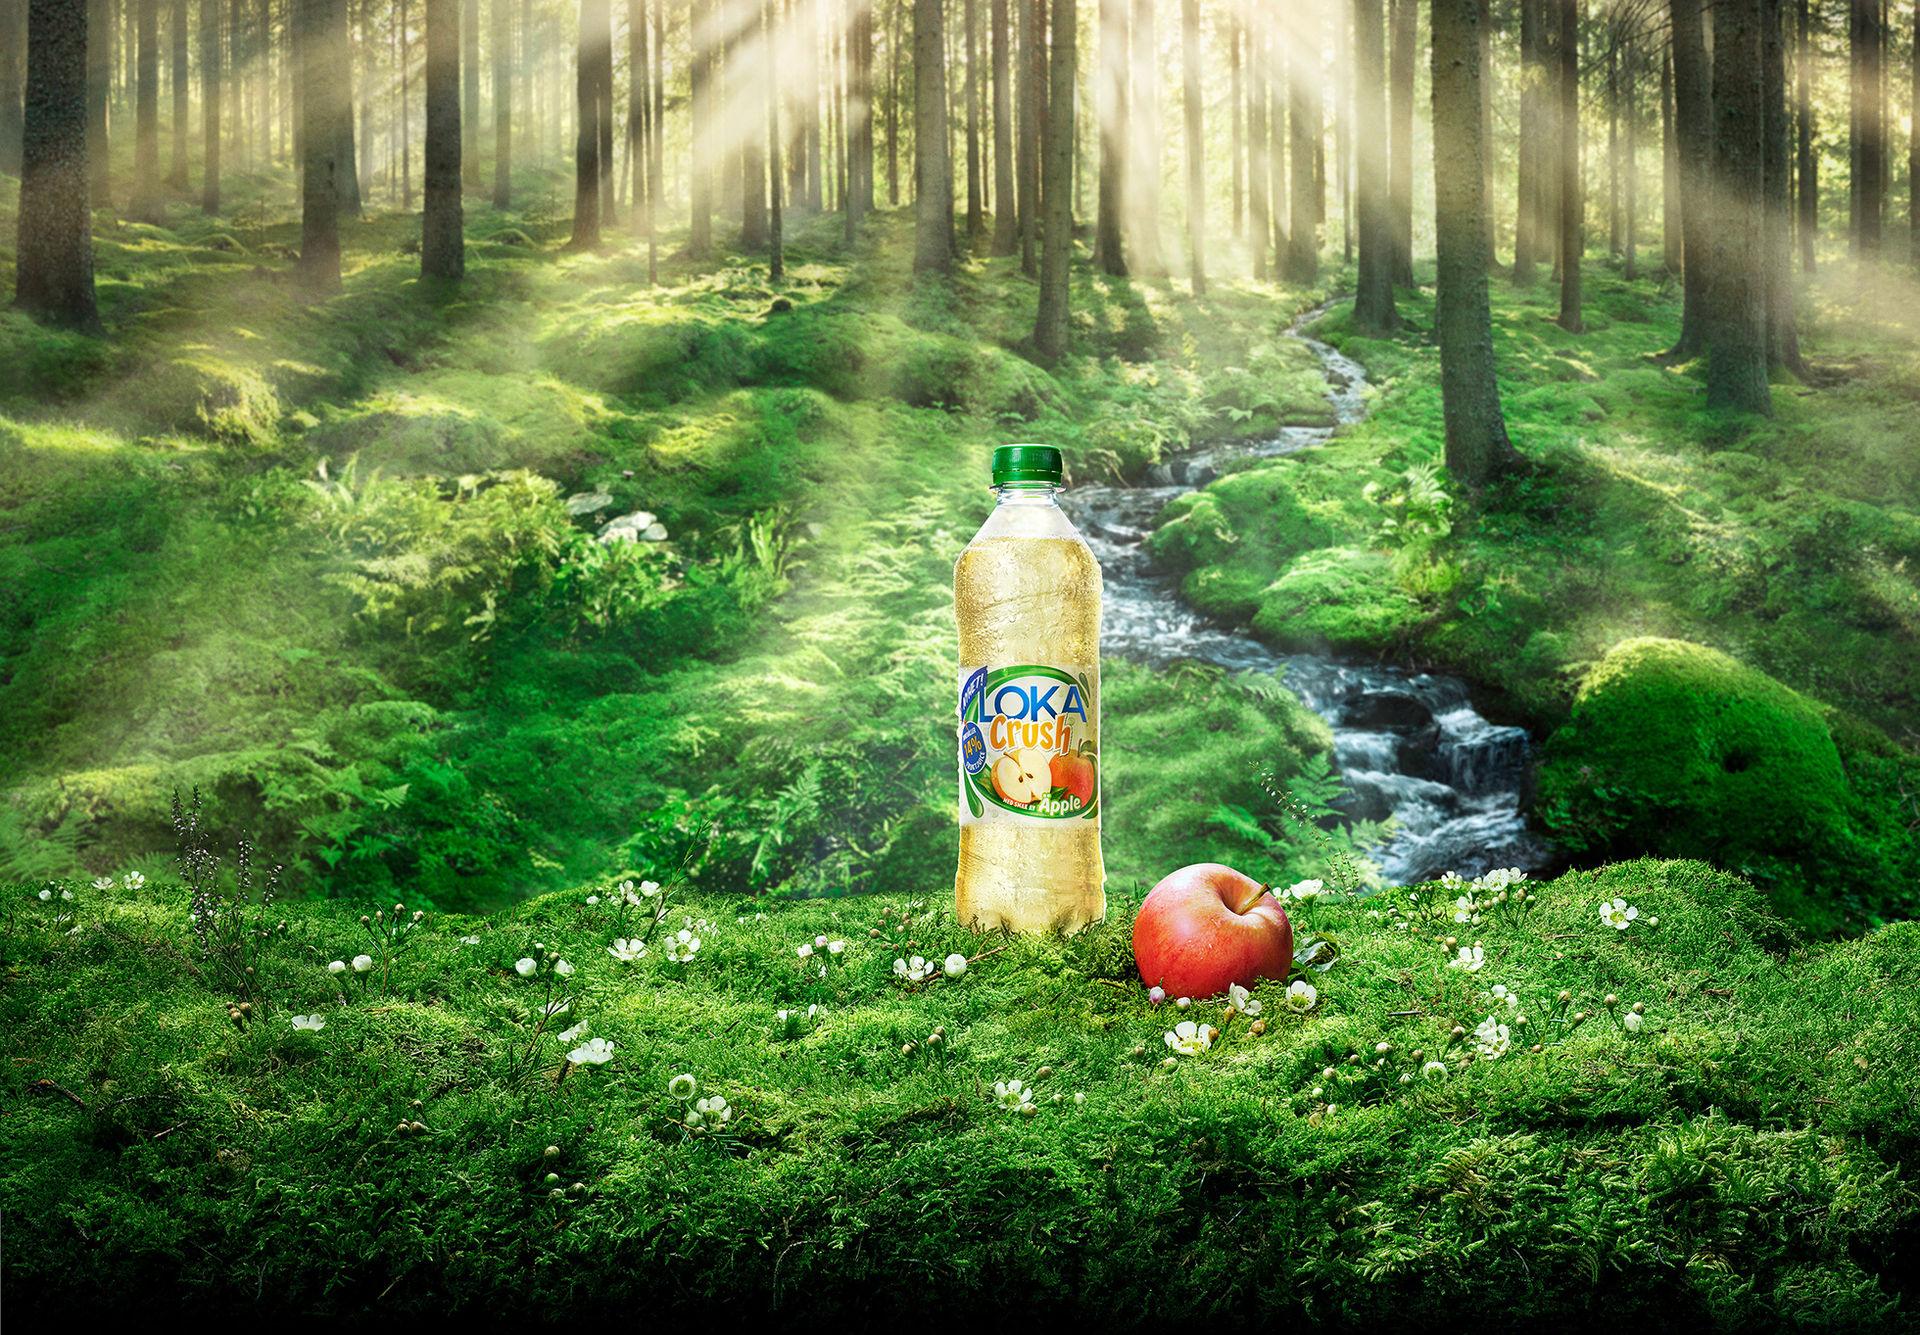 Nu kommer Loka Crush med äpple-smak